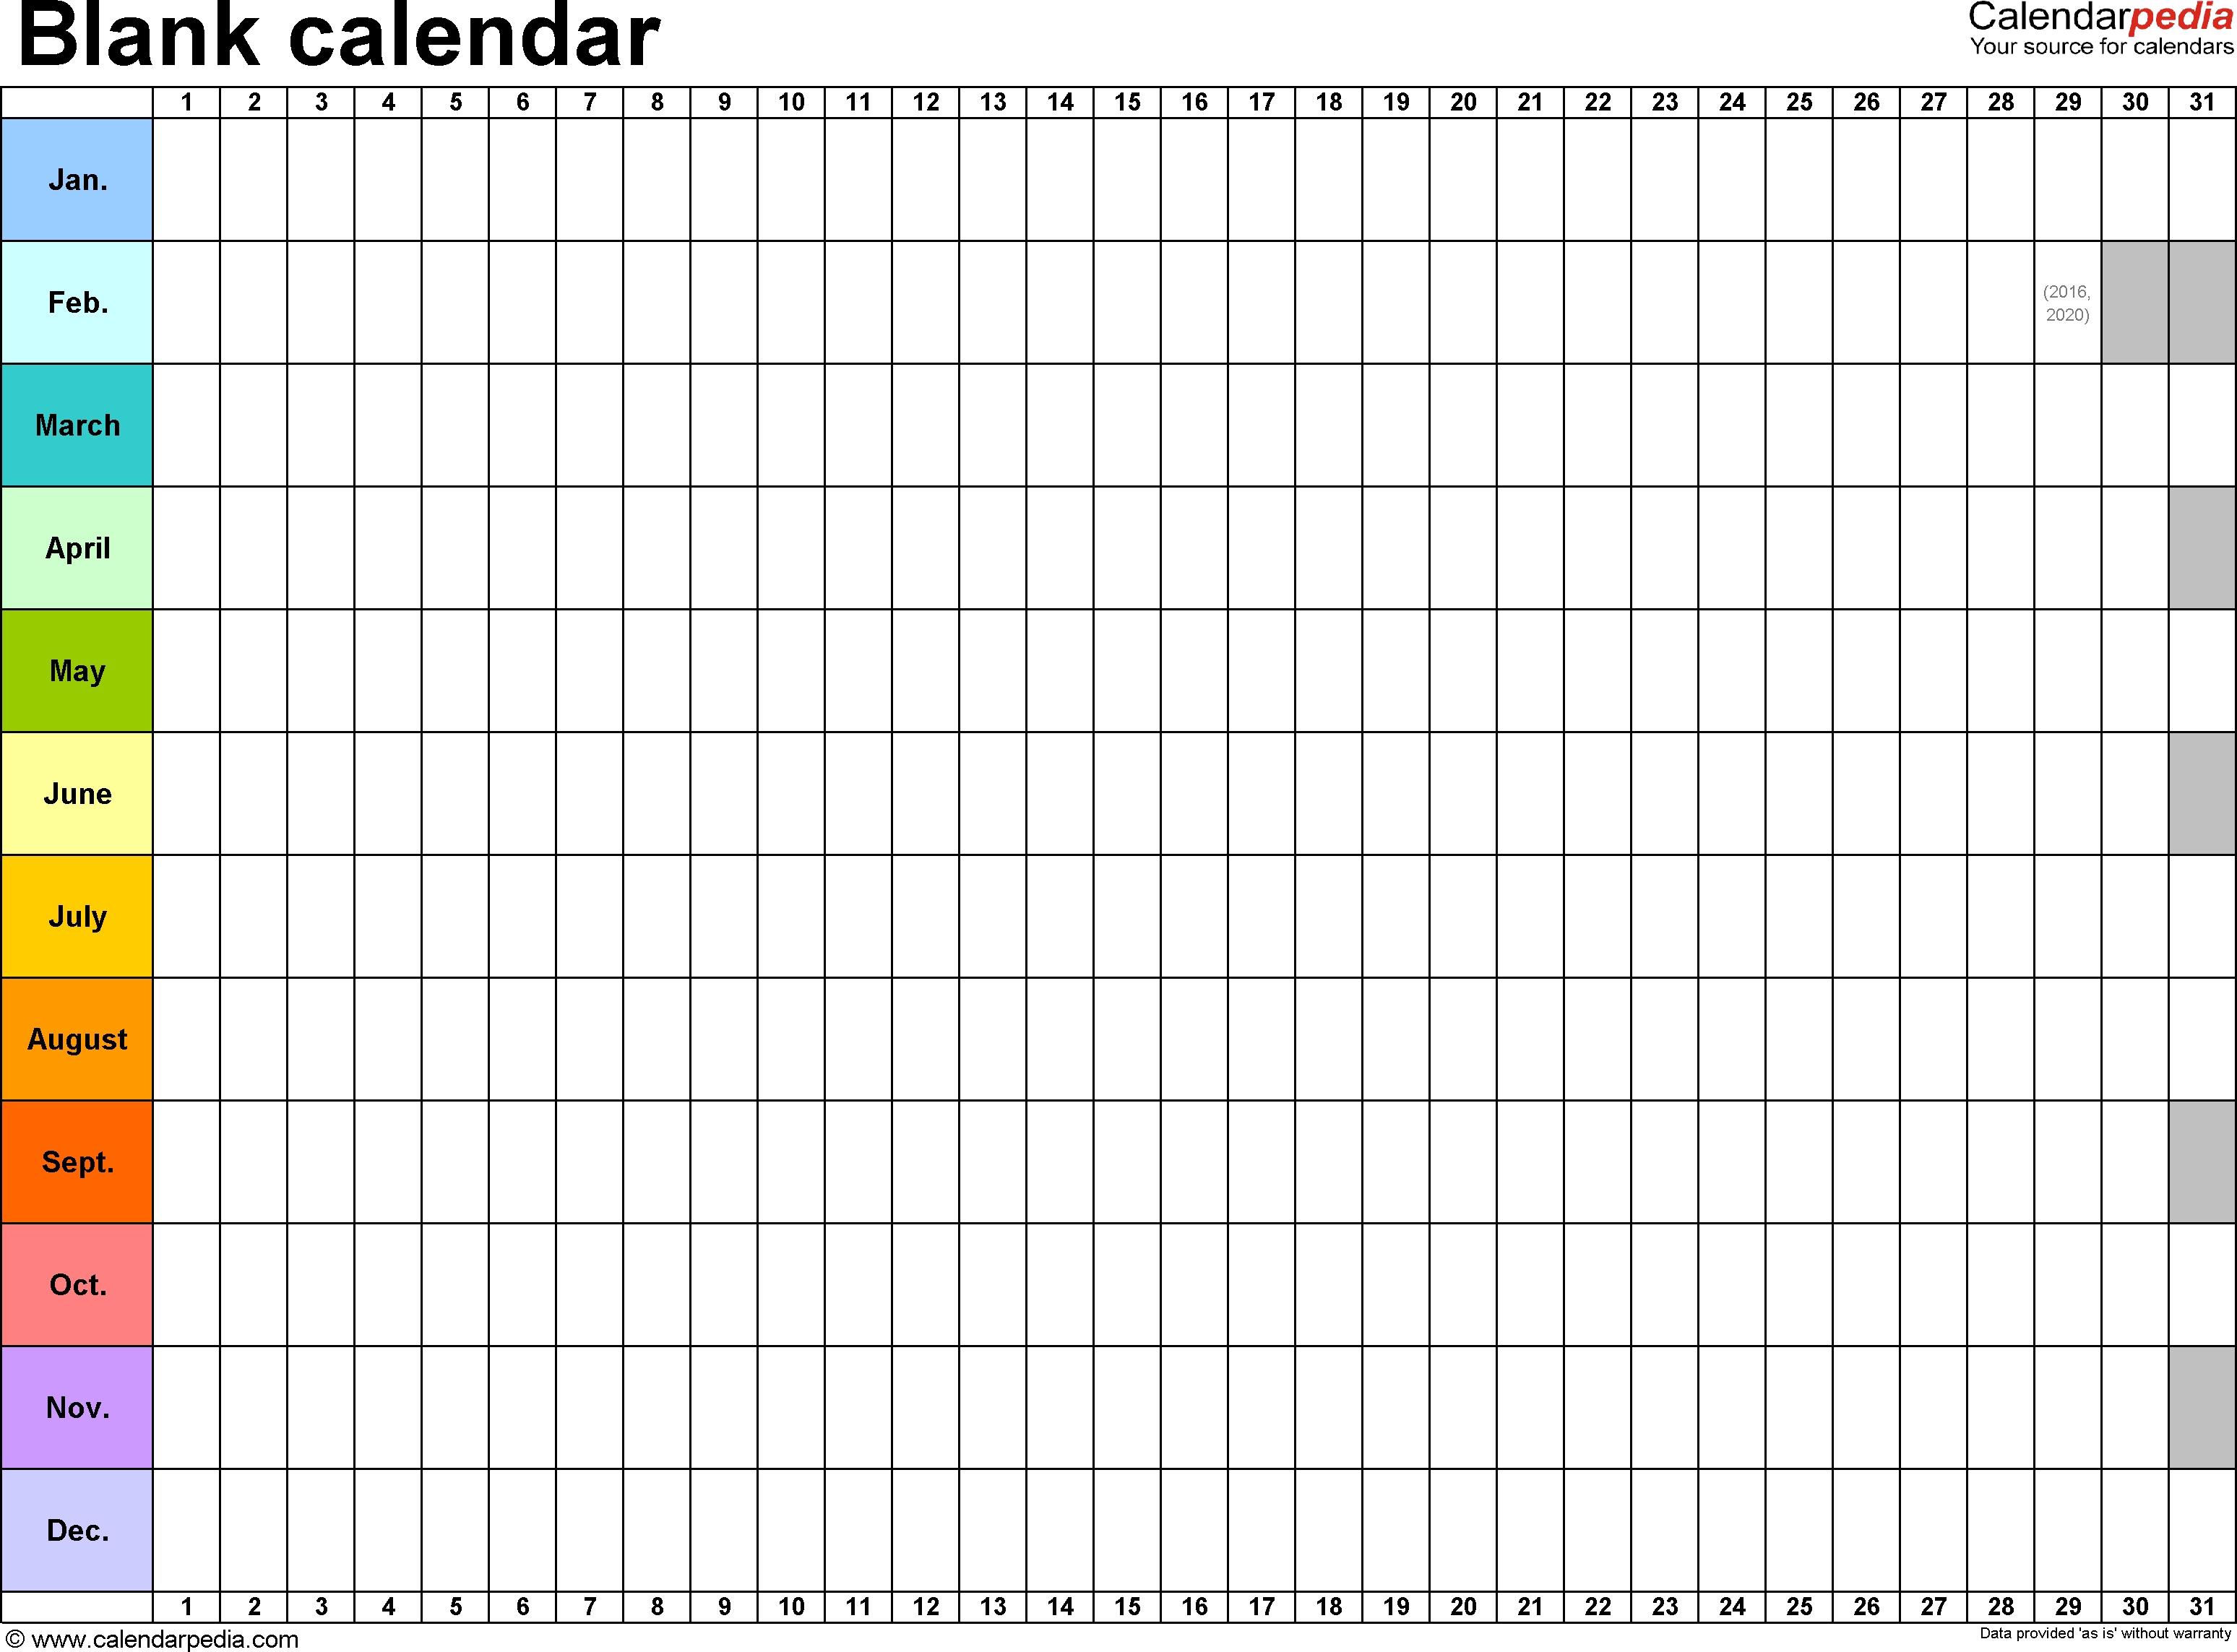 Blank Calendar - 9 Free Printable Microsoft Word Templates with Free Fillable Blank Calendar Templates